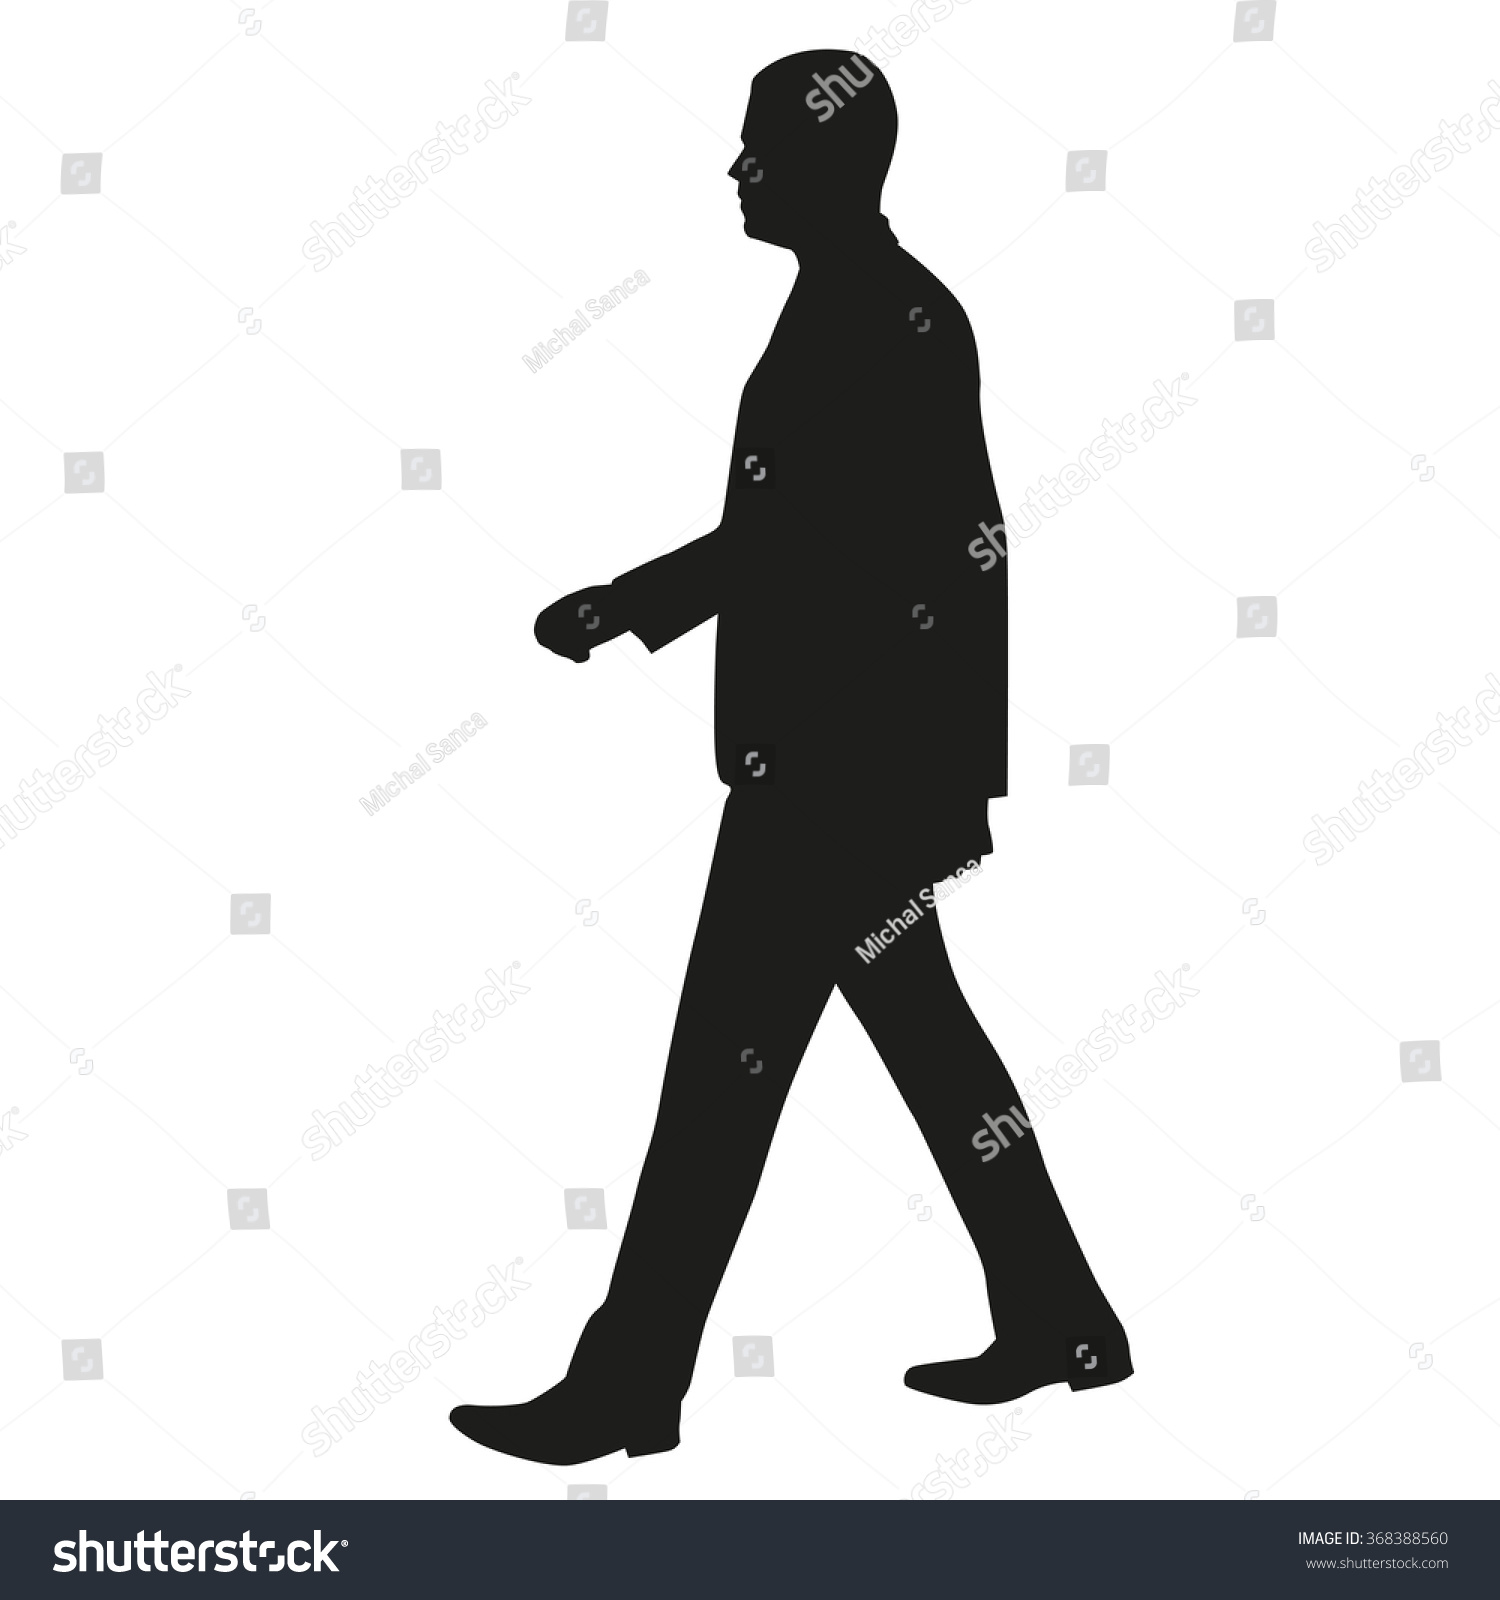 Human walking side view